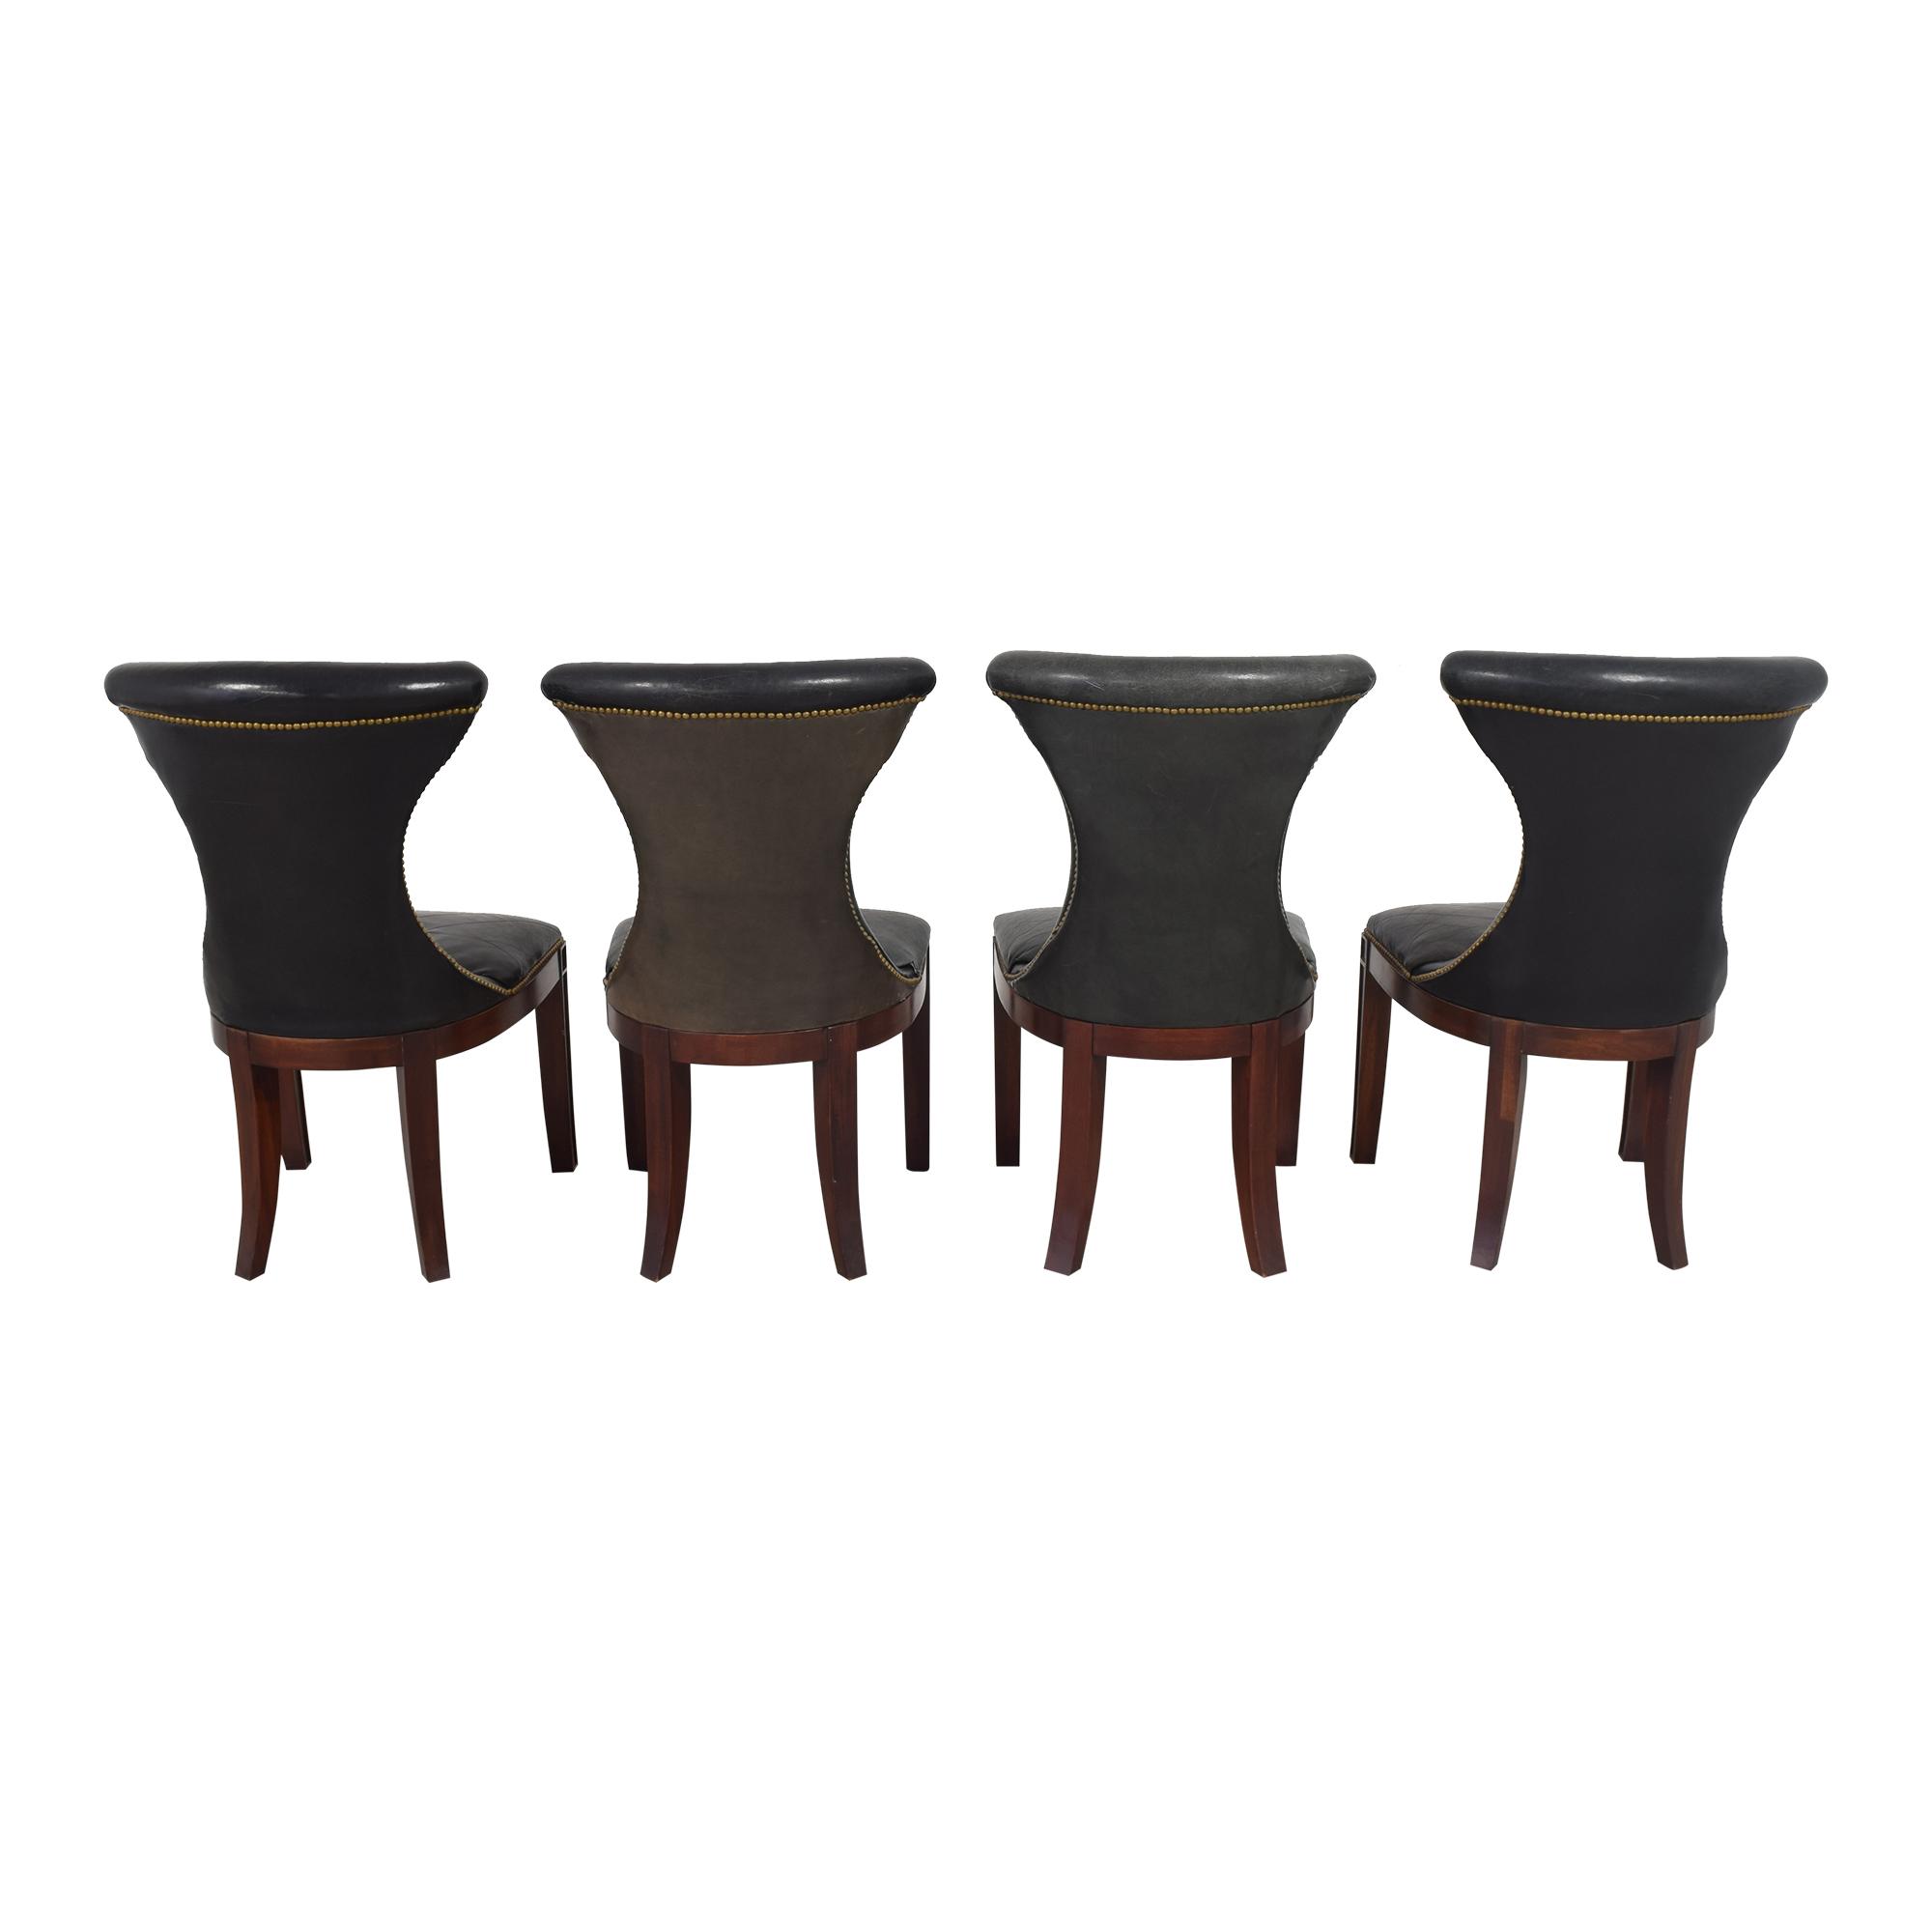 Ralph Lauren Home Ralph Lauren Nailhead Trim Dining Chairs used